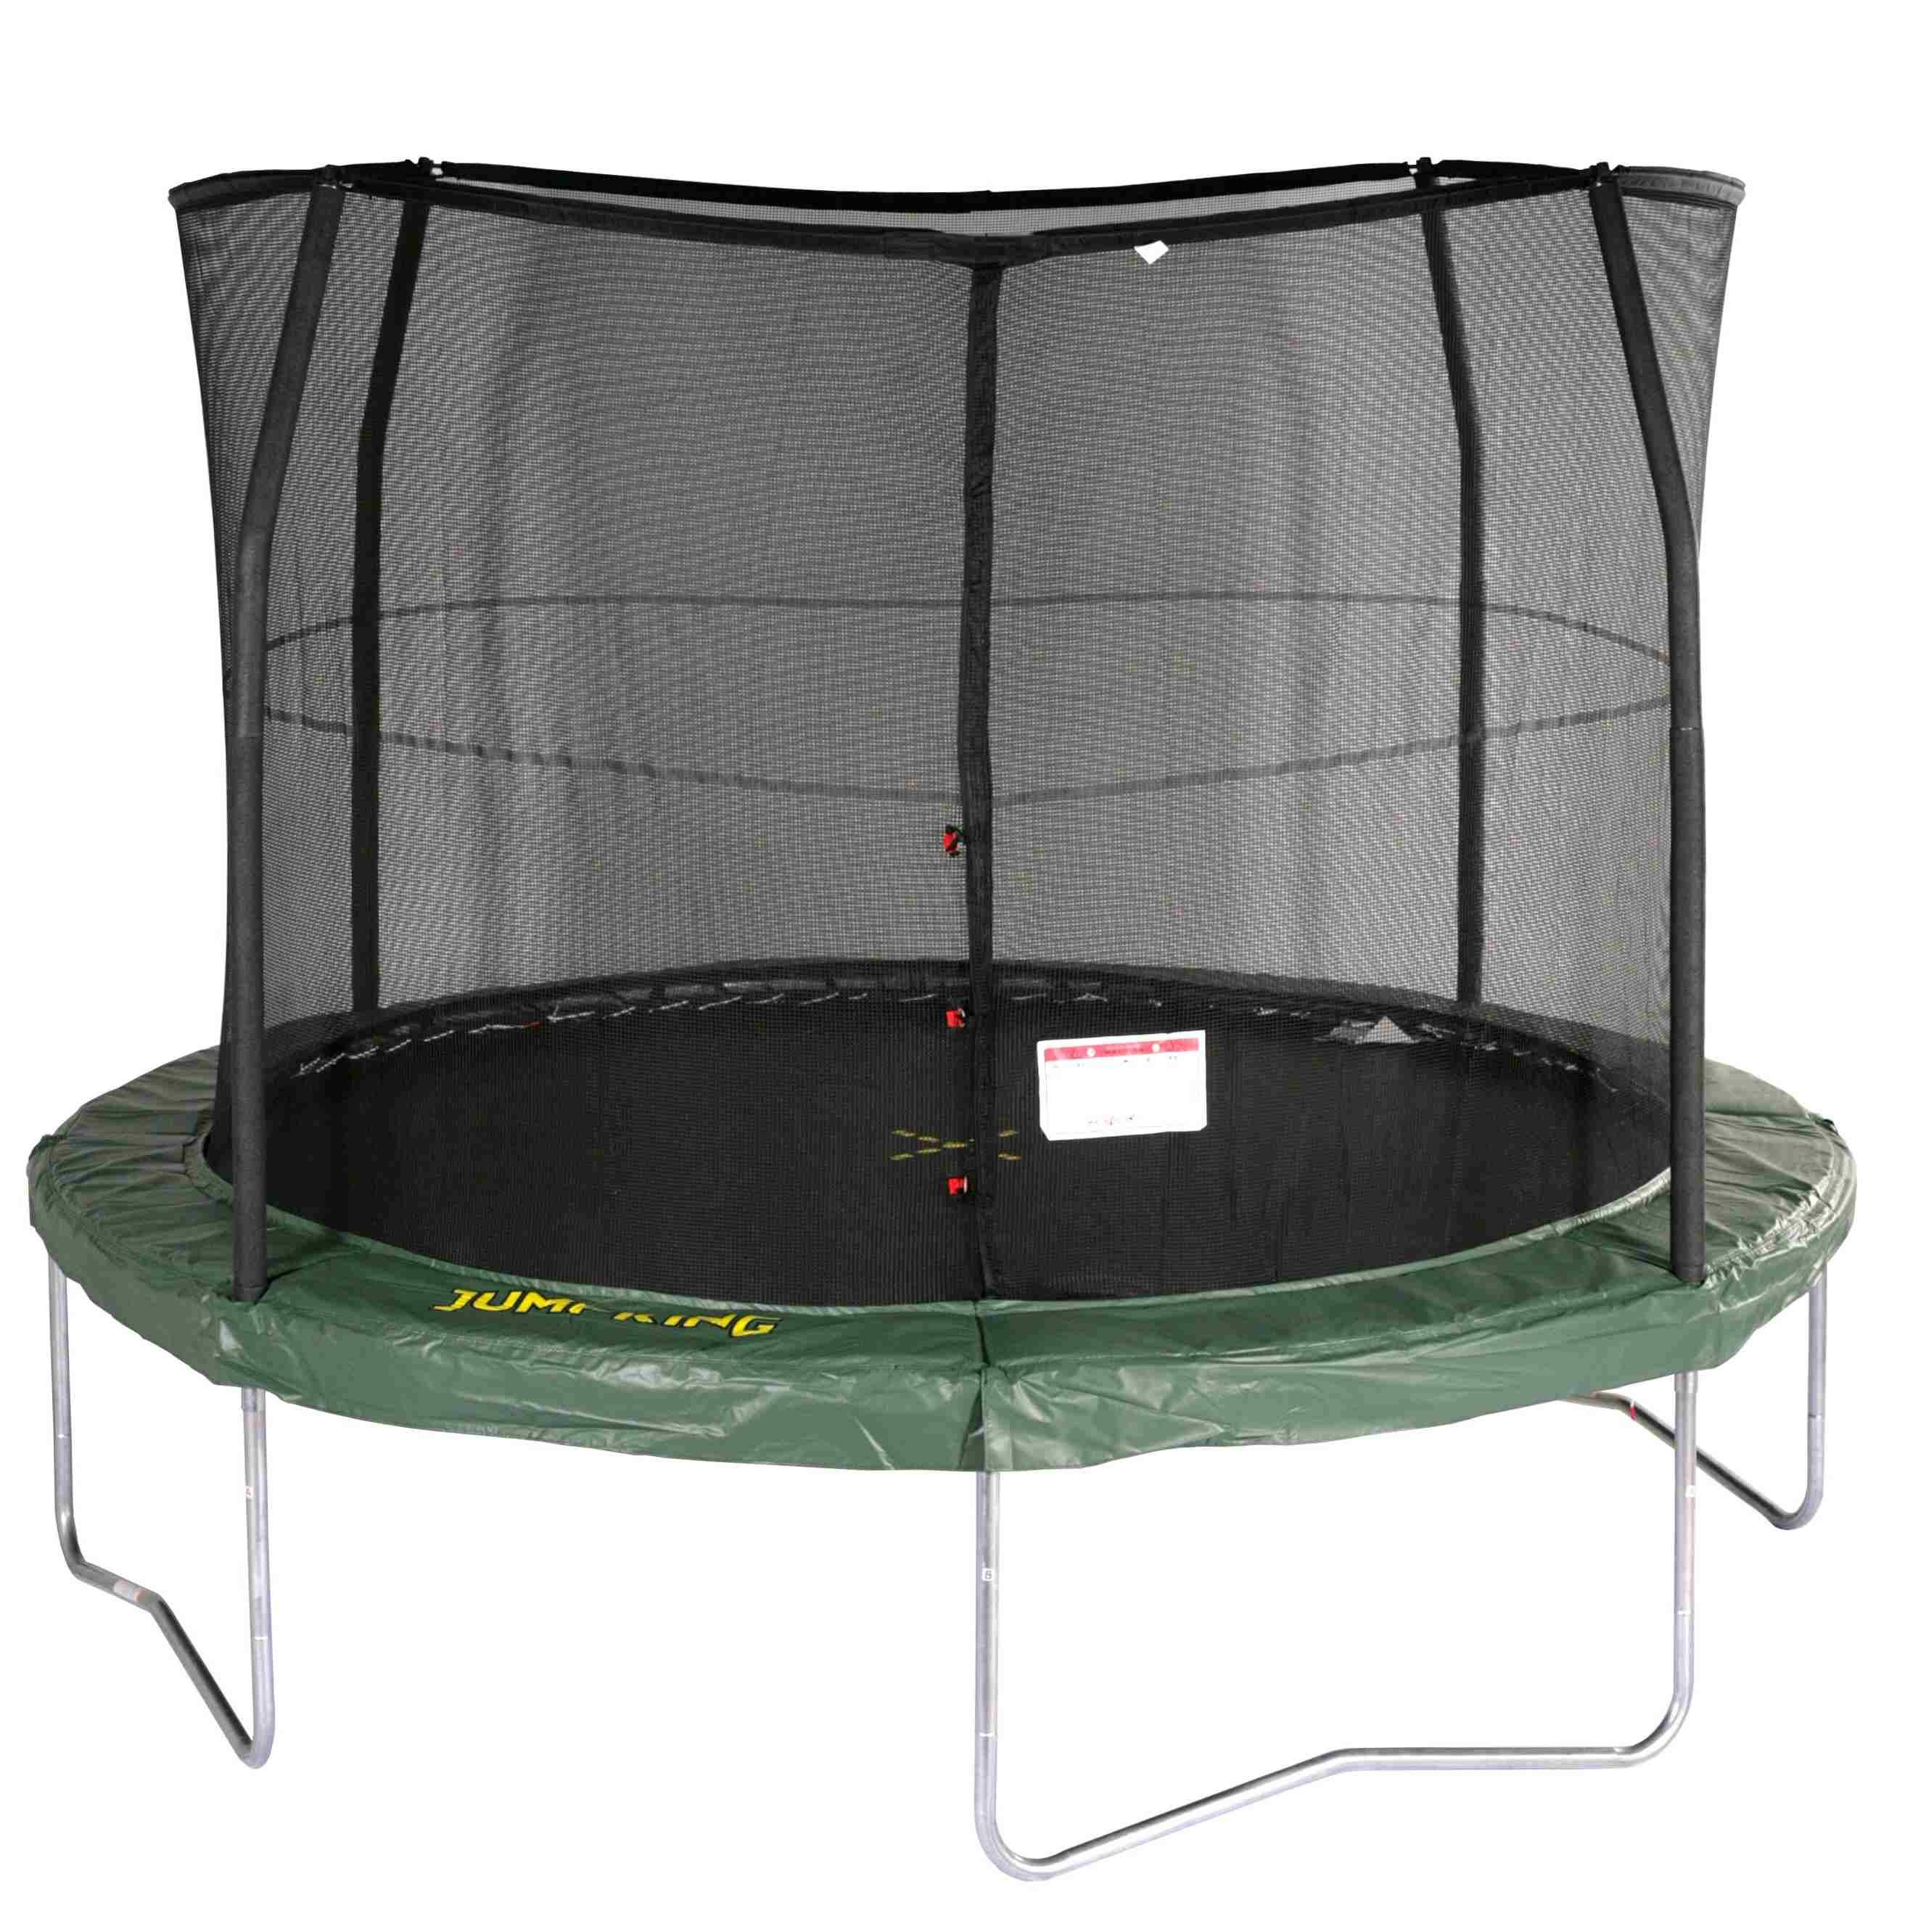 10ft Jumppod Trampoline At Asda £99.99